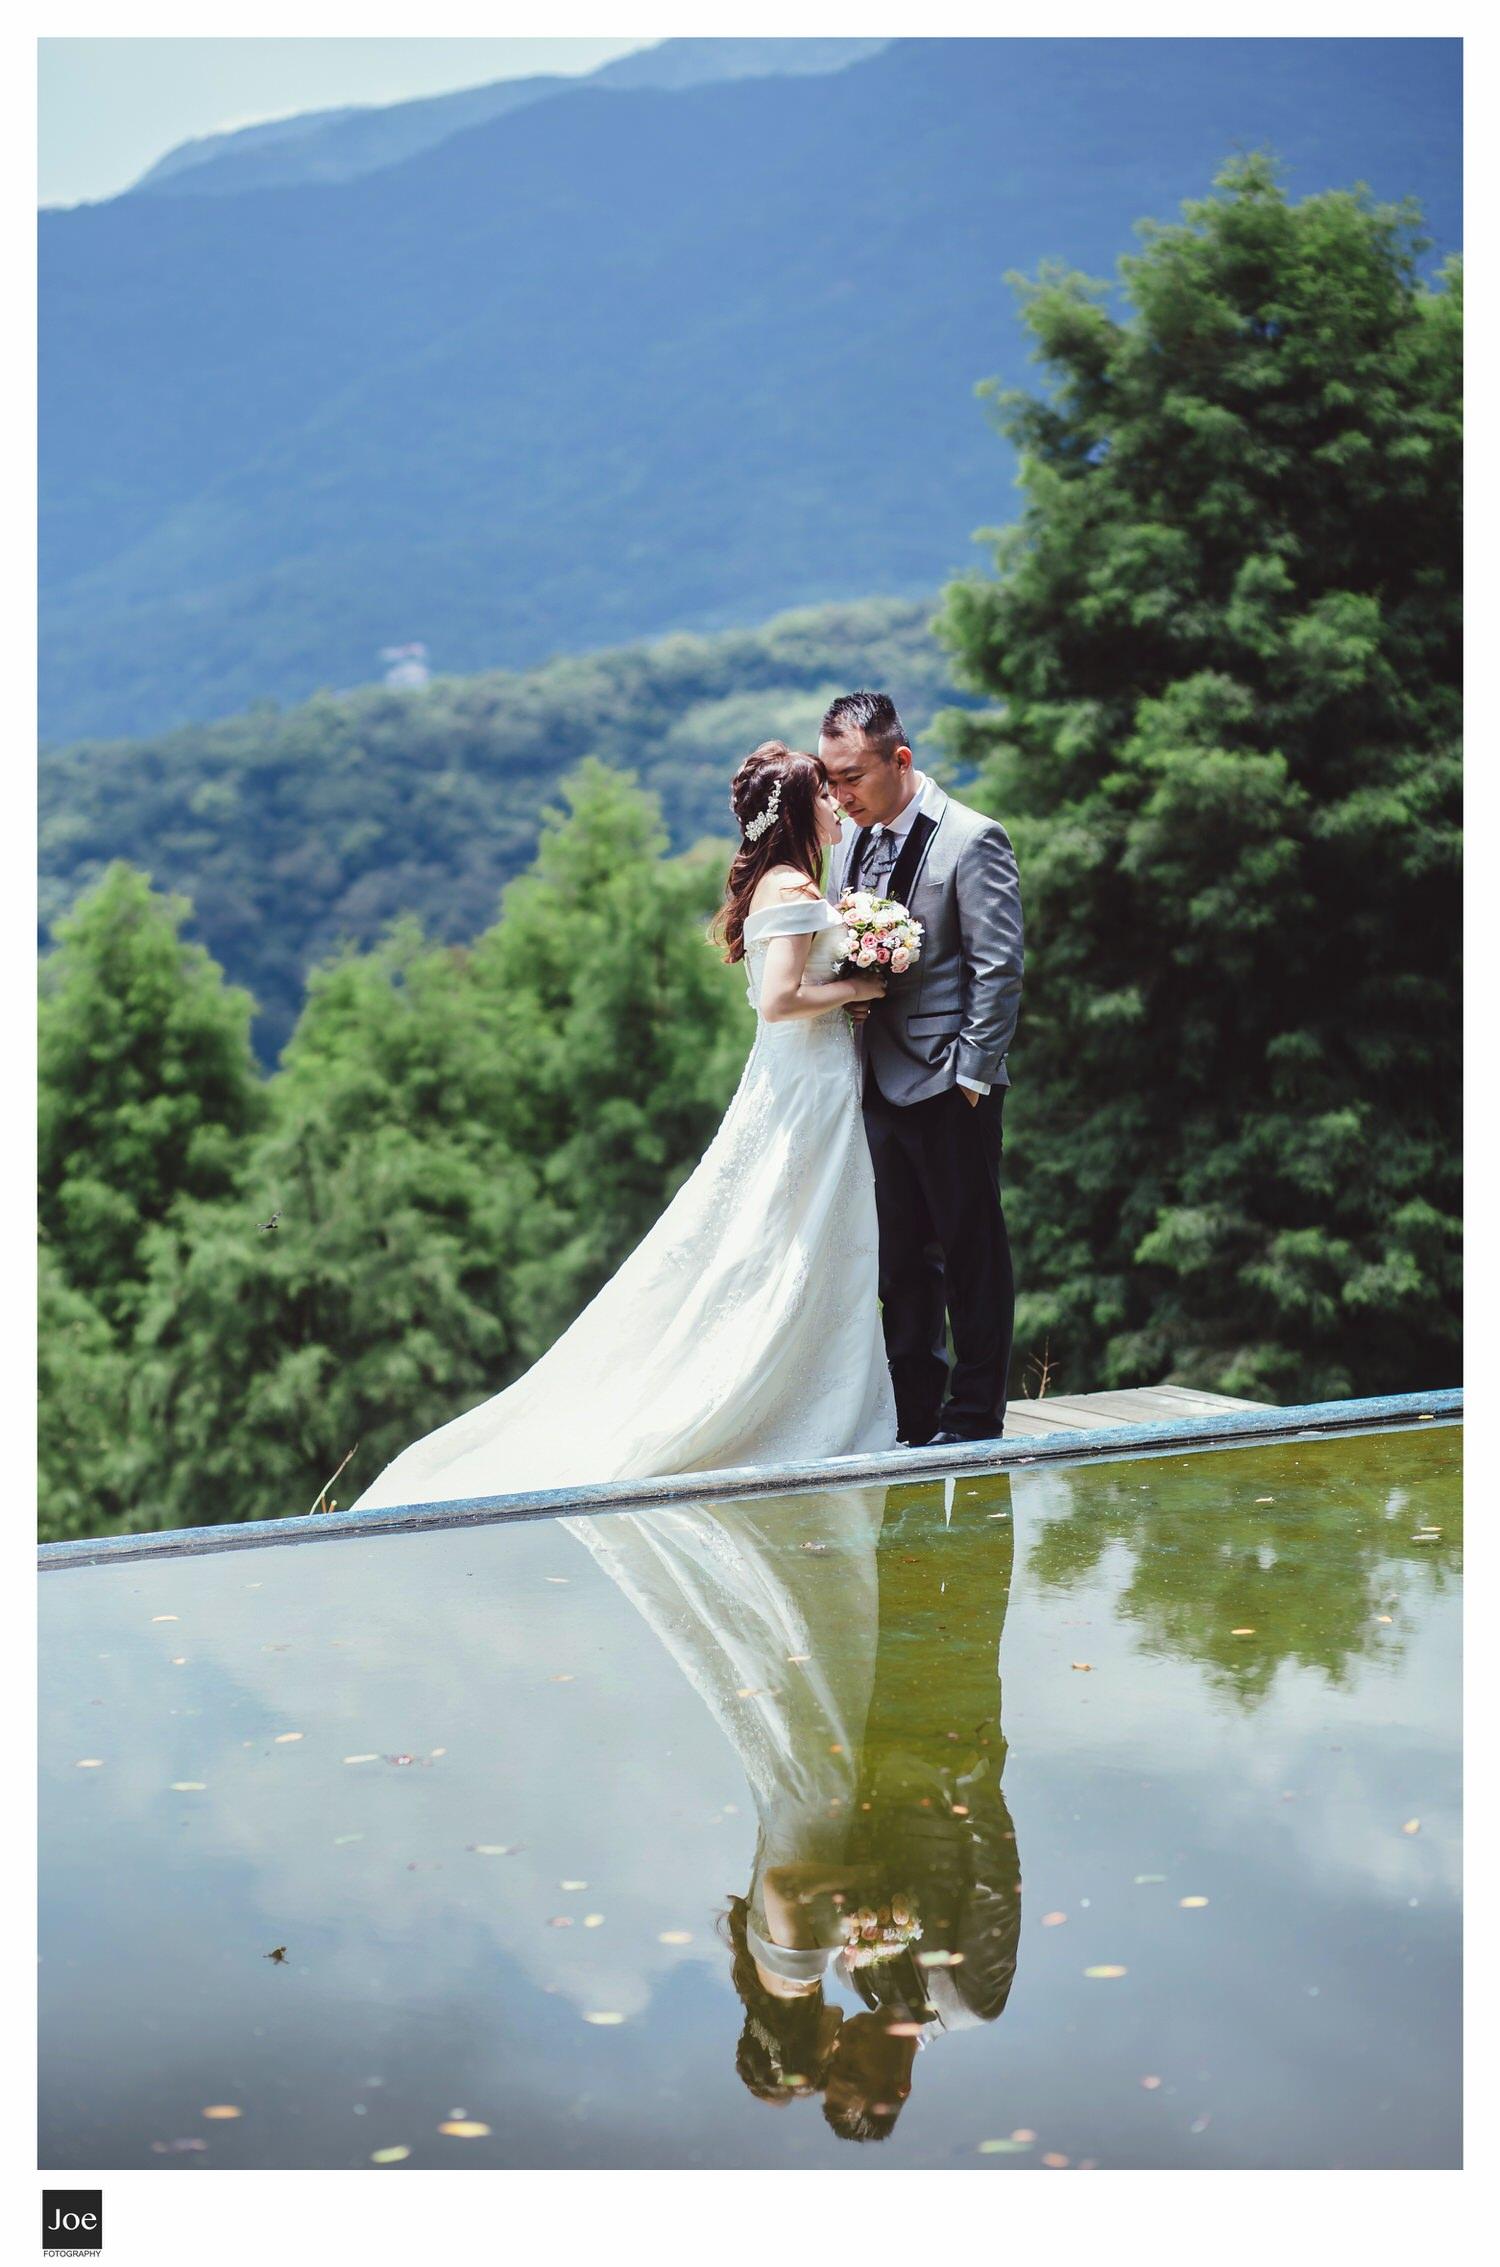 taiwan-pre-wedding-roger-wing-joe-fotography-014.jpg